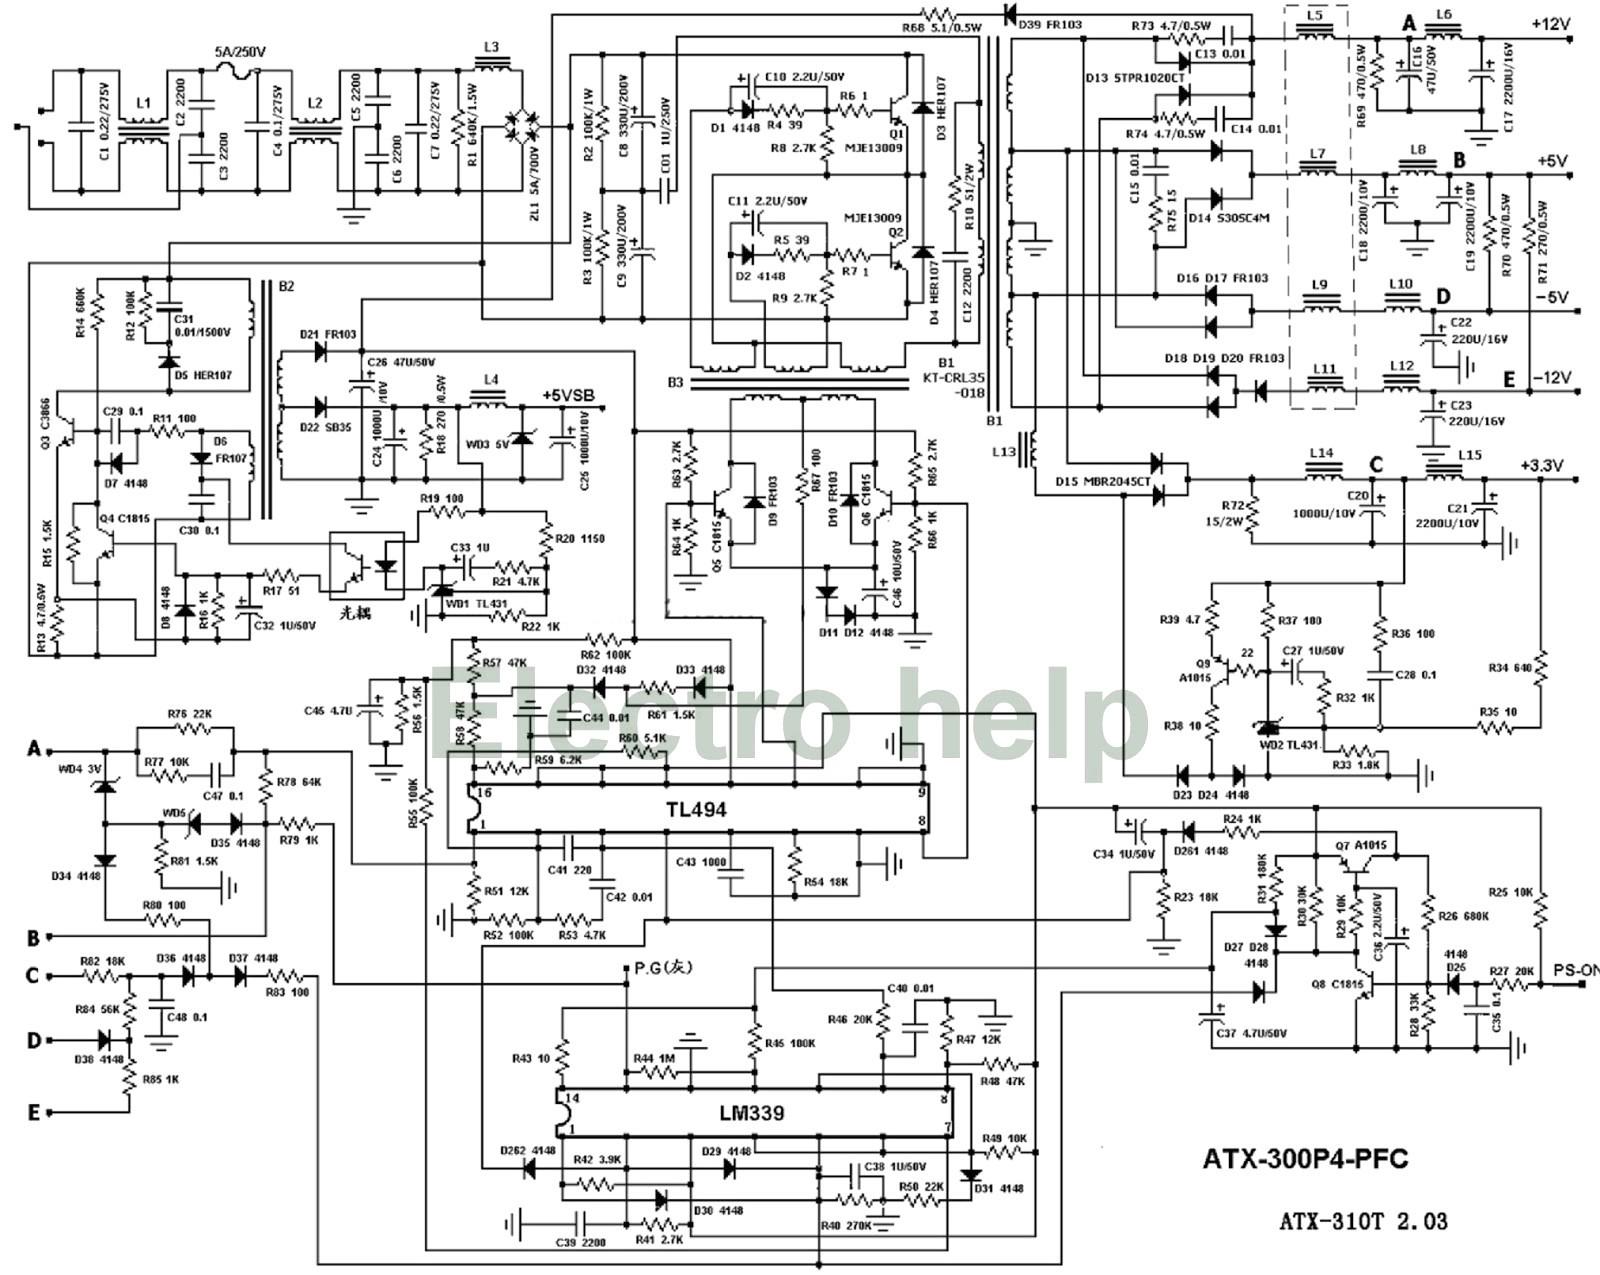 Kohler Engine Primary Wiring Diagram